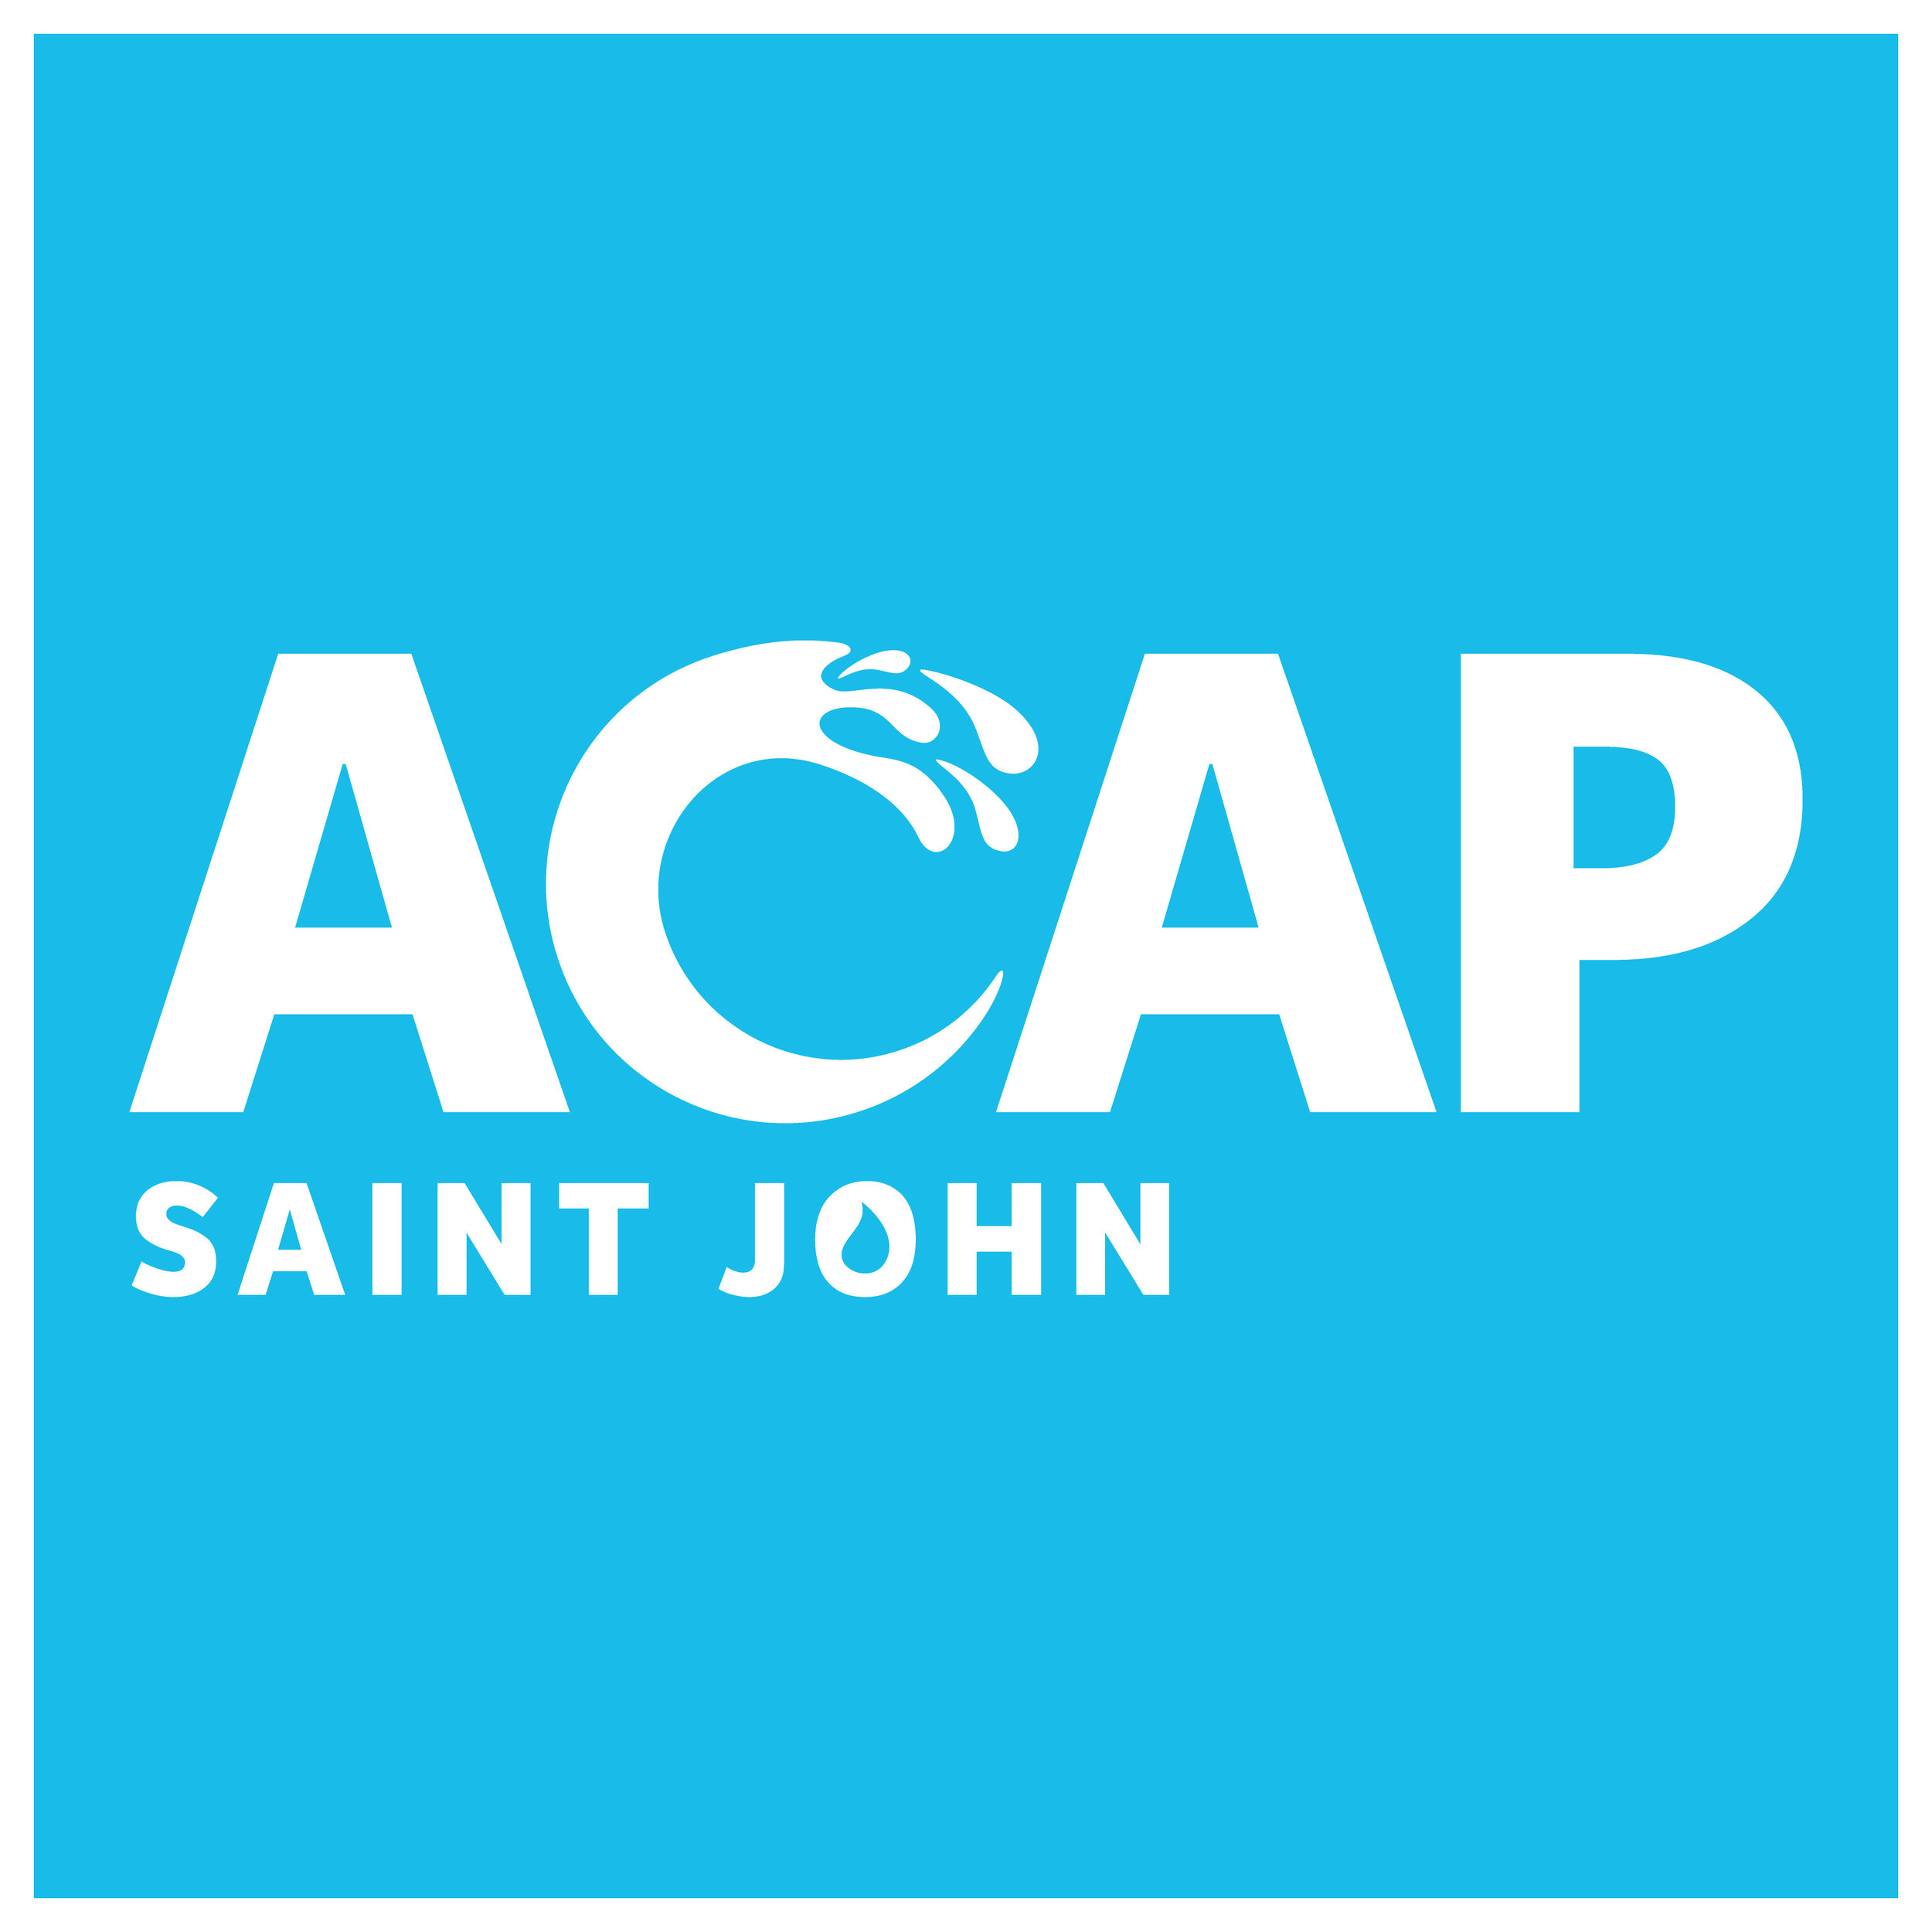 ACAP-Logo-square-with-border-01.jpg